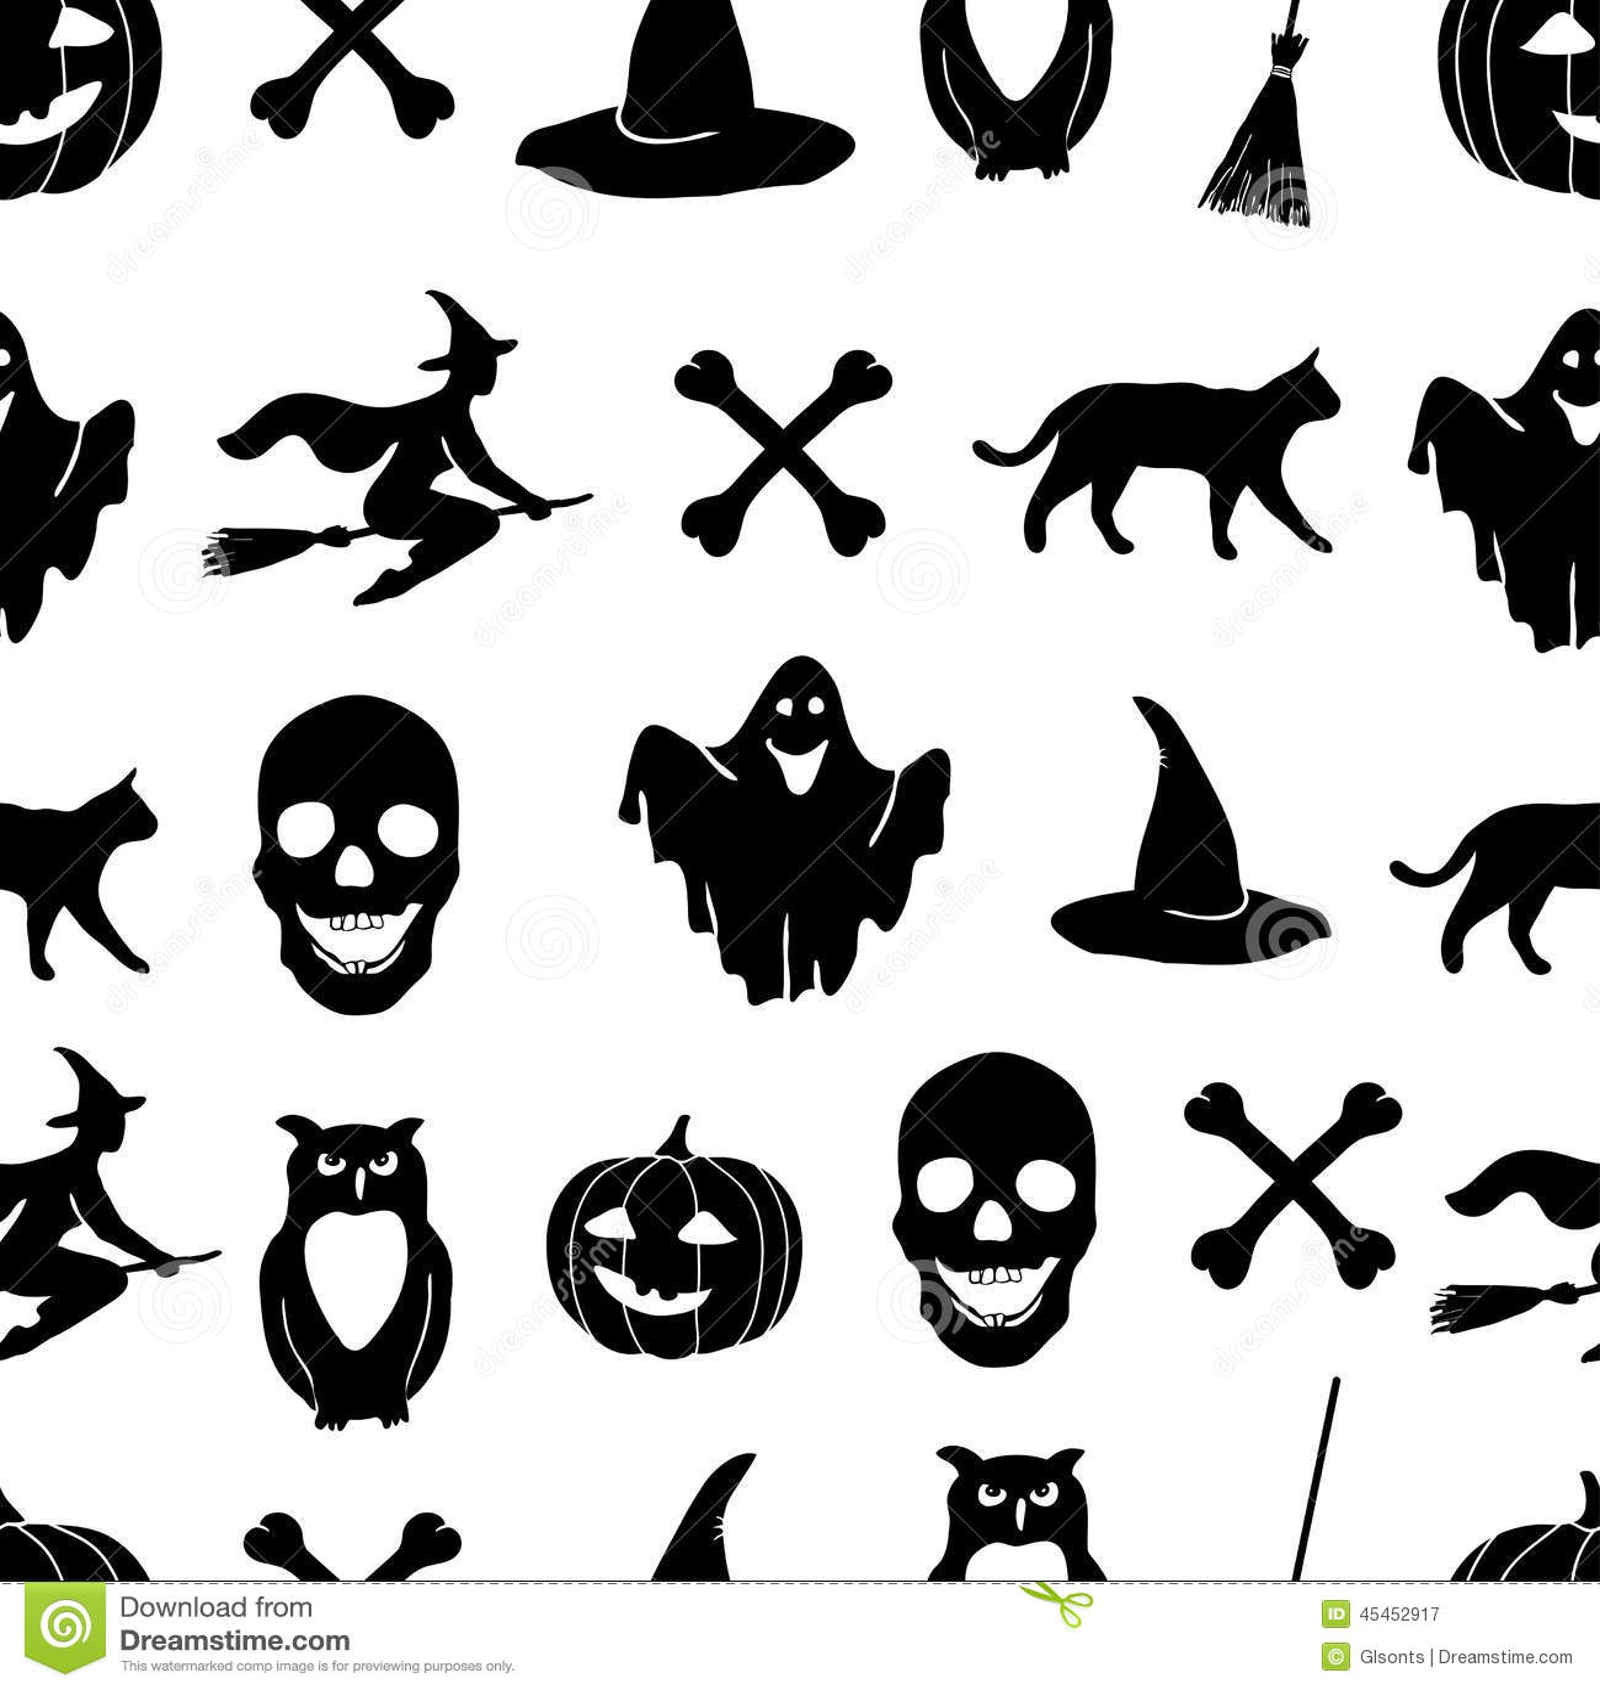 Skeleton Pattern Wallpaper Cute Halloween Background Eps Jpg Stock Vector Image 45452917